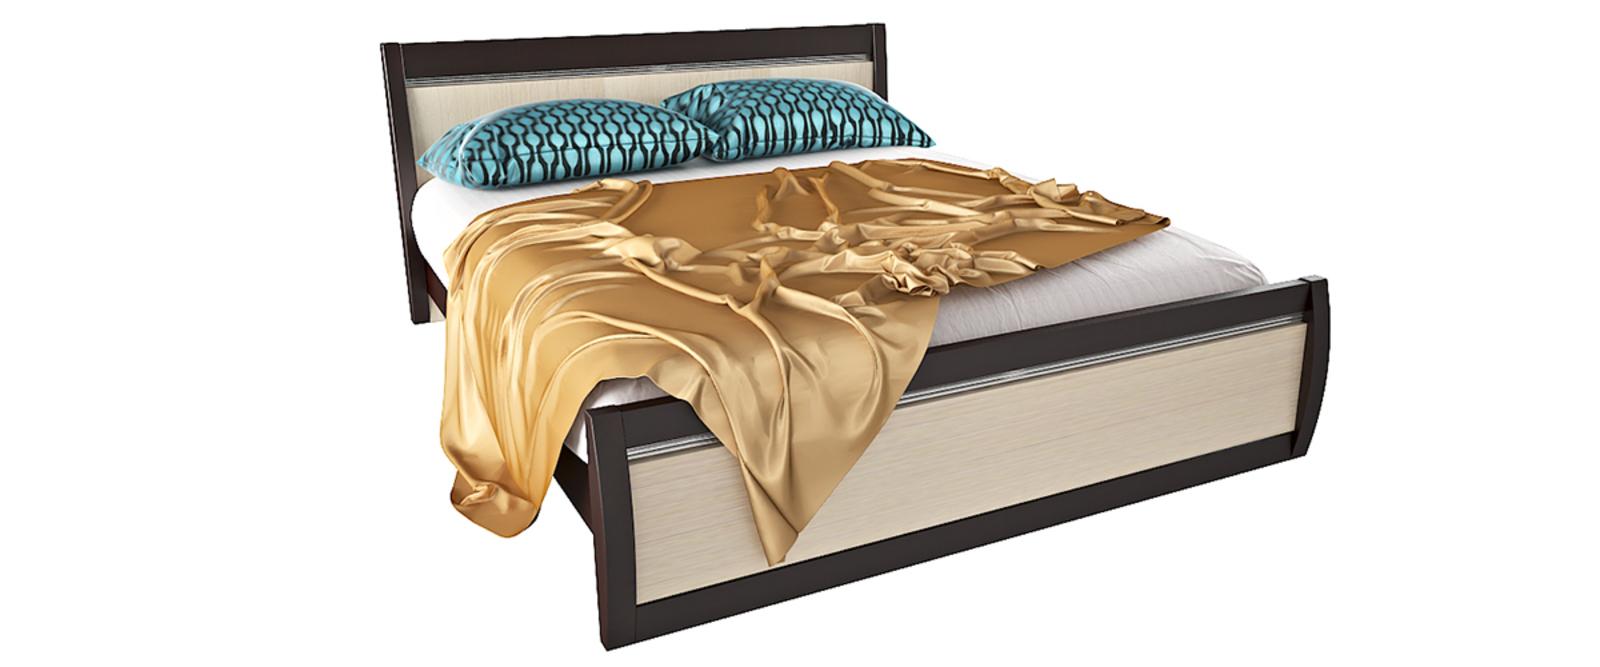 Кровать каркасная HomeMe Корсика AEL0090000